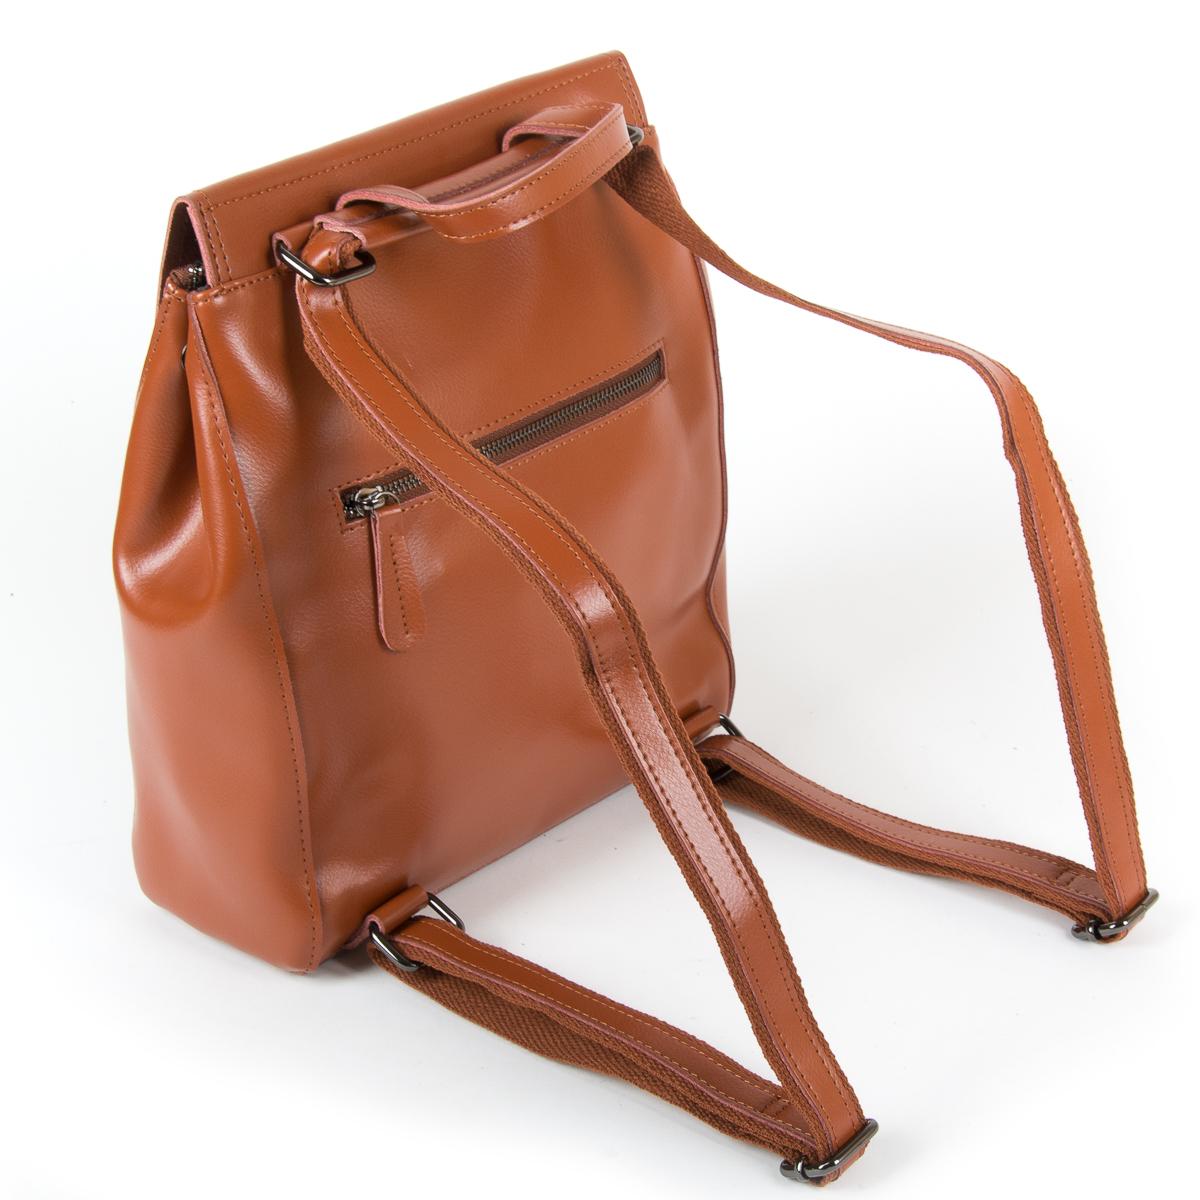 Сумка Женская Рюкзак кожа ALEX RAI 9-01 1005 khaki - фото 4